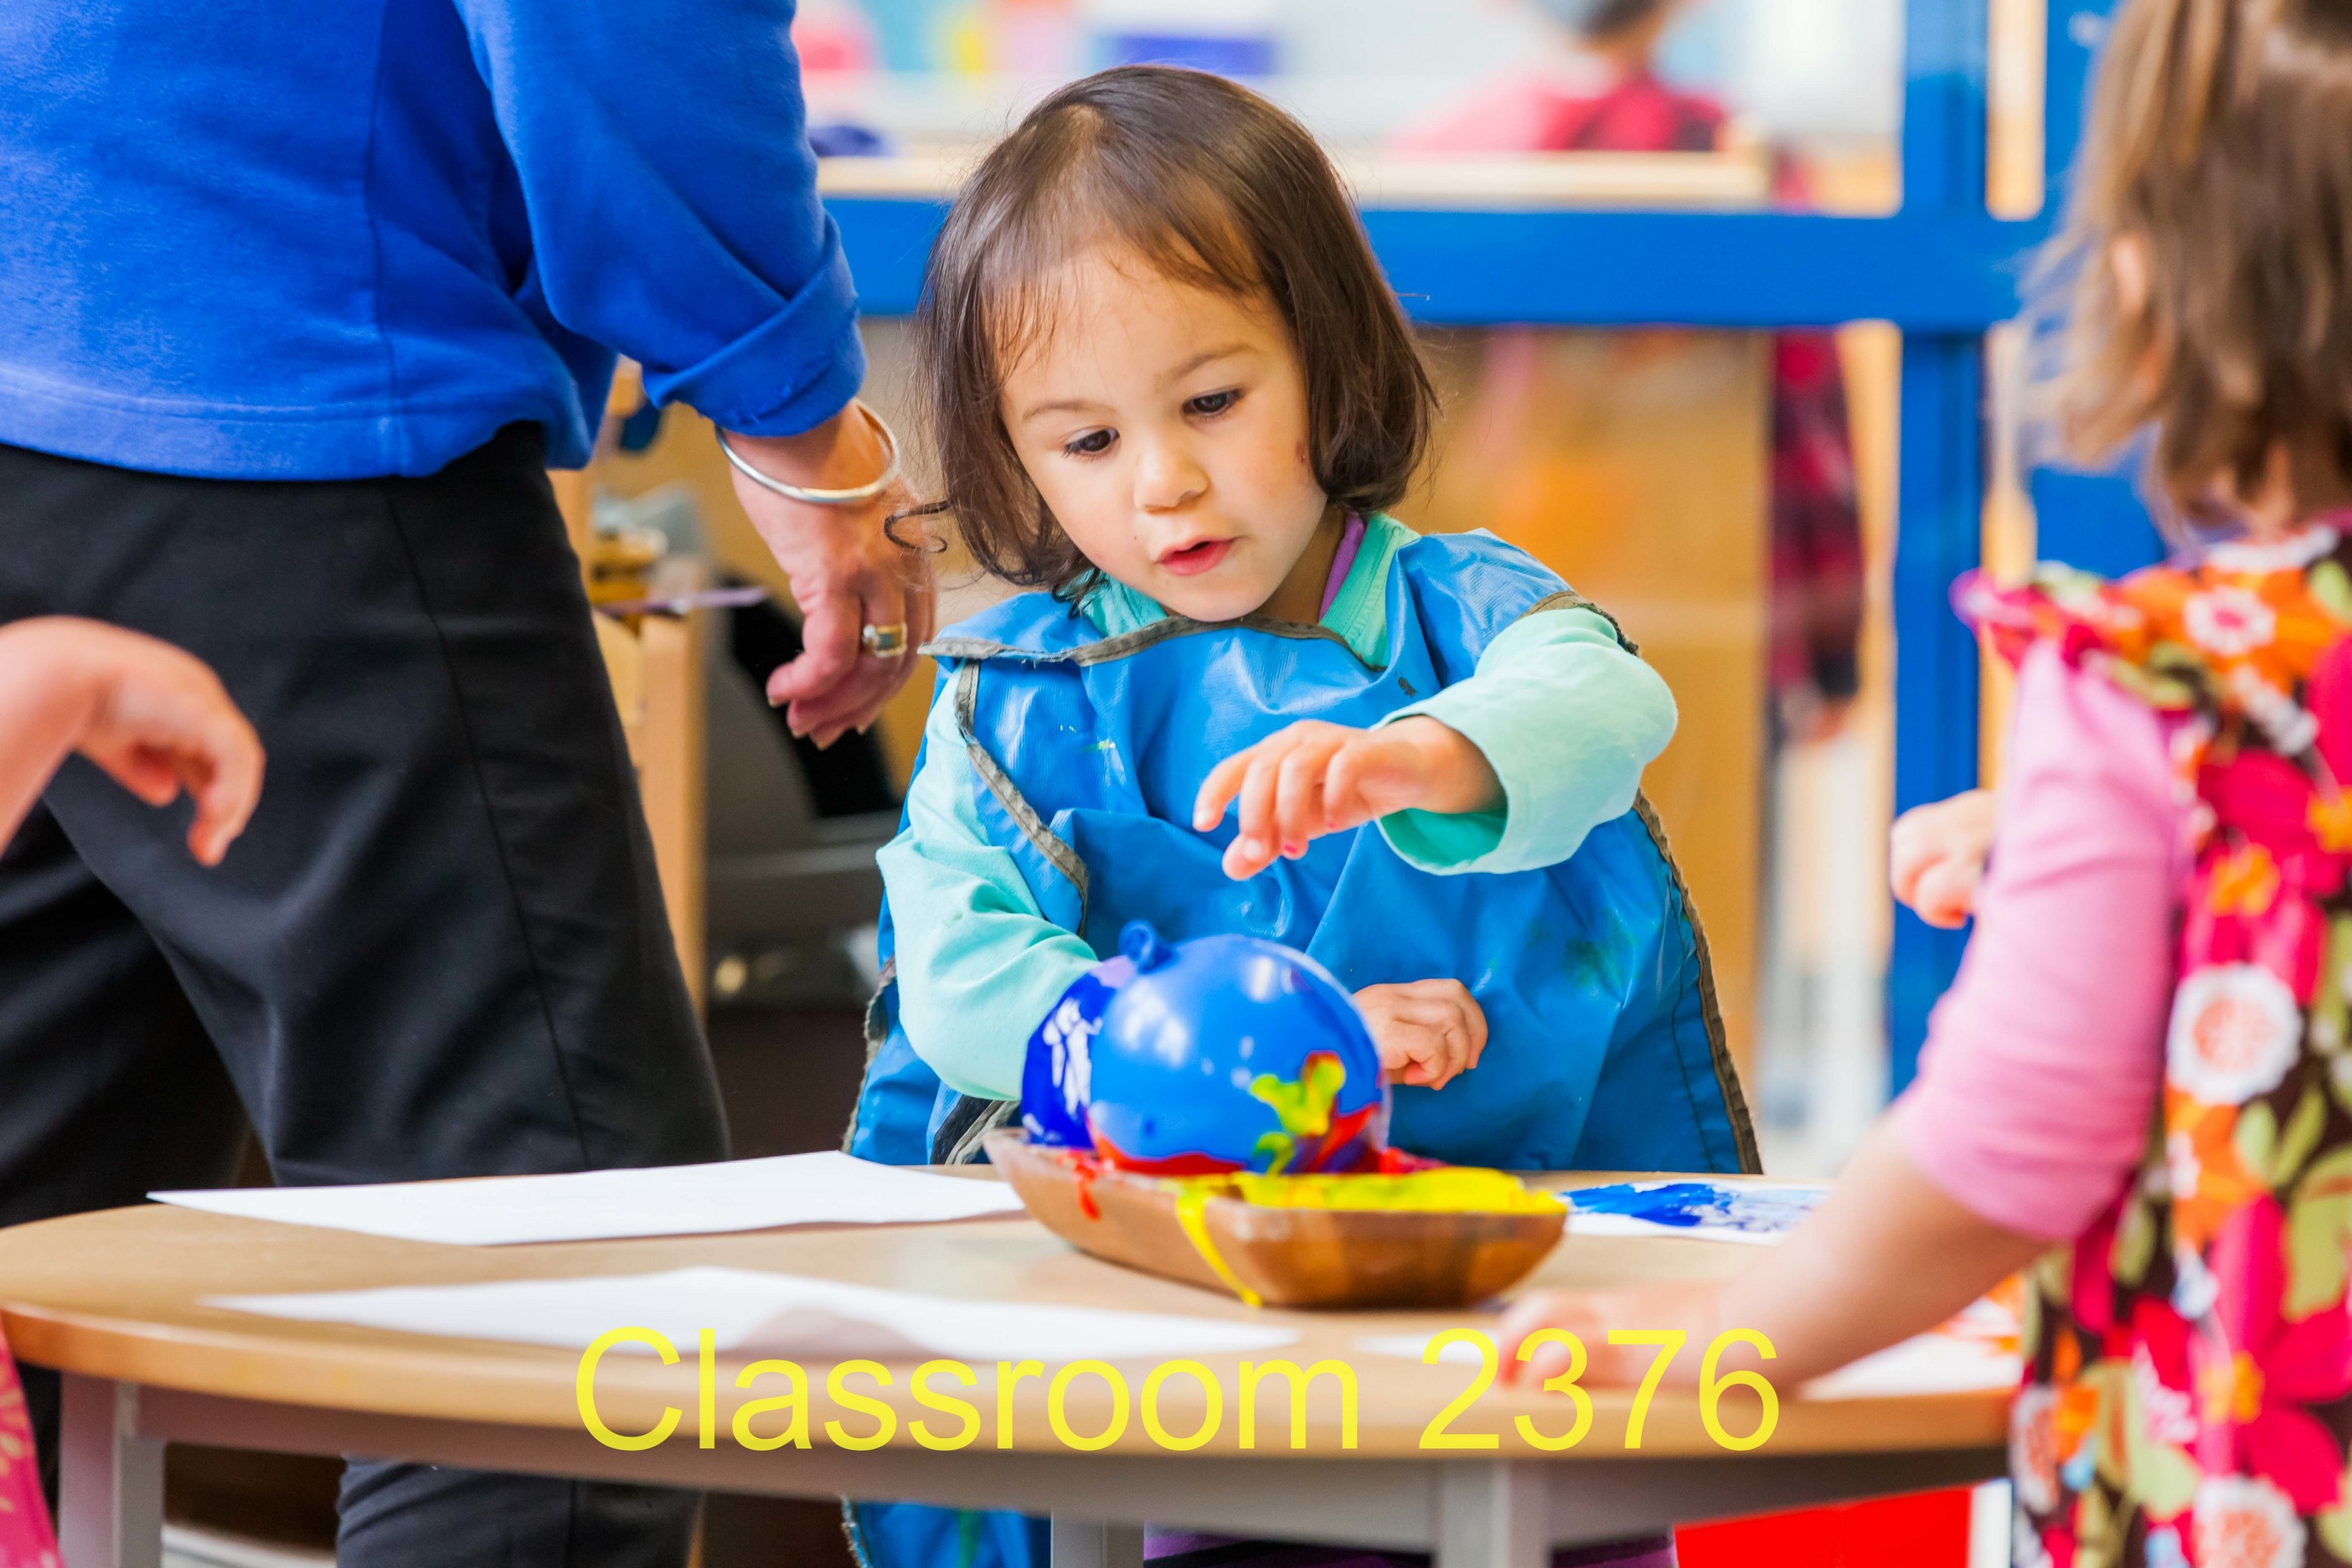 Classroom 2376